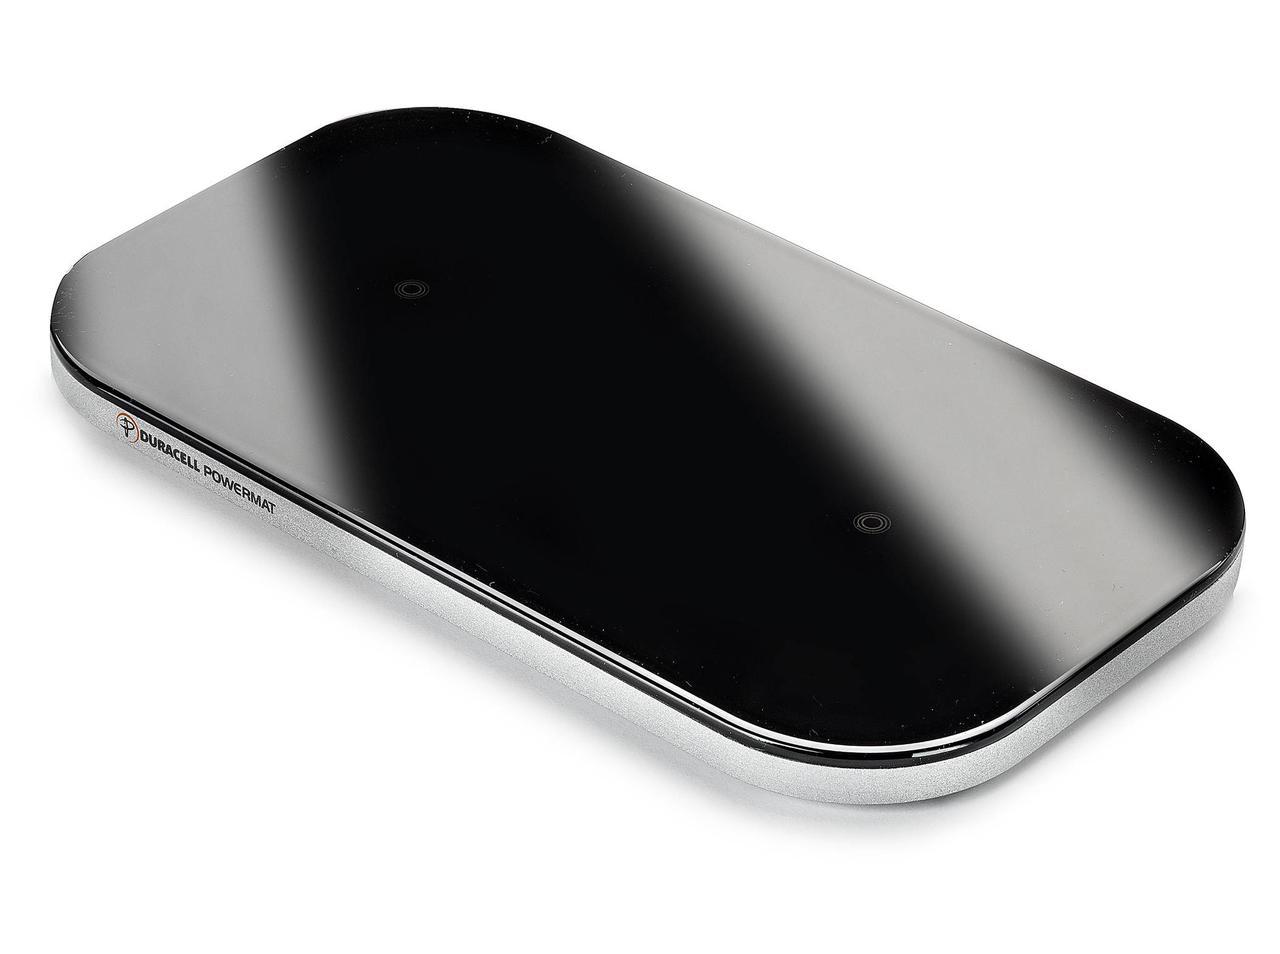 Беспроводное зарядное устройство для двух устройств Duracell PowerMat Black (90990)